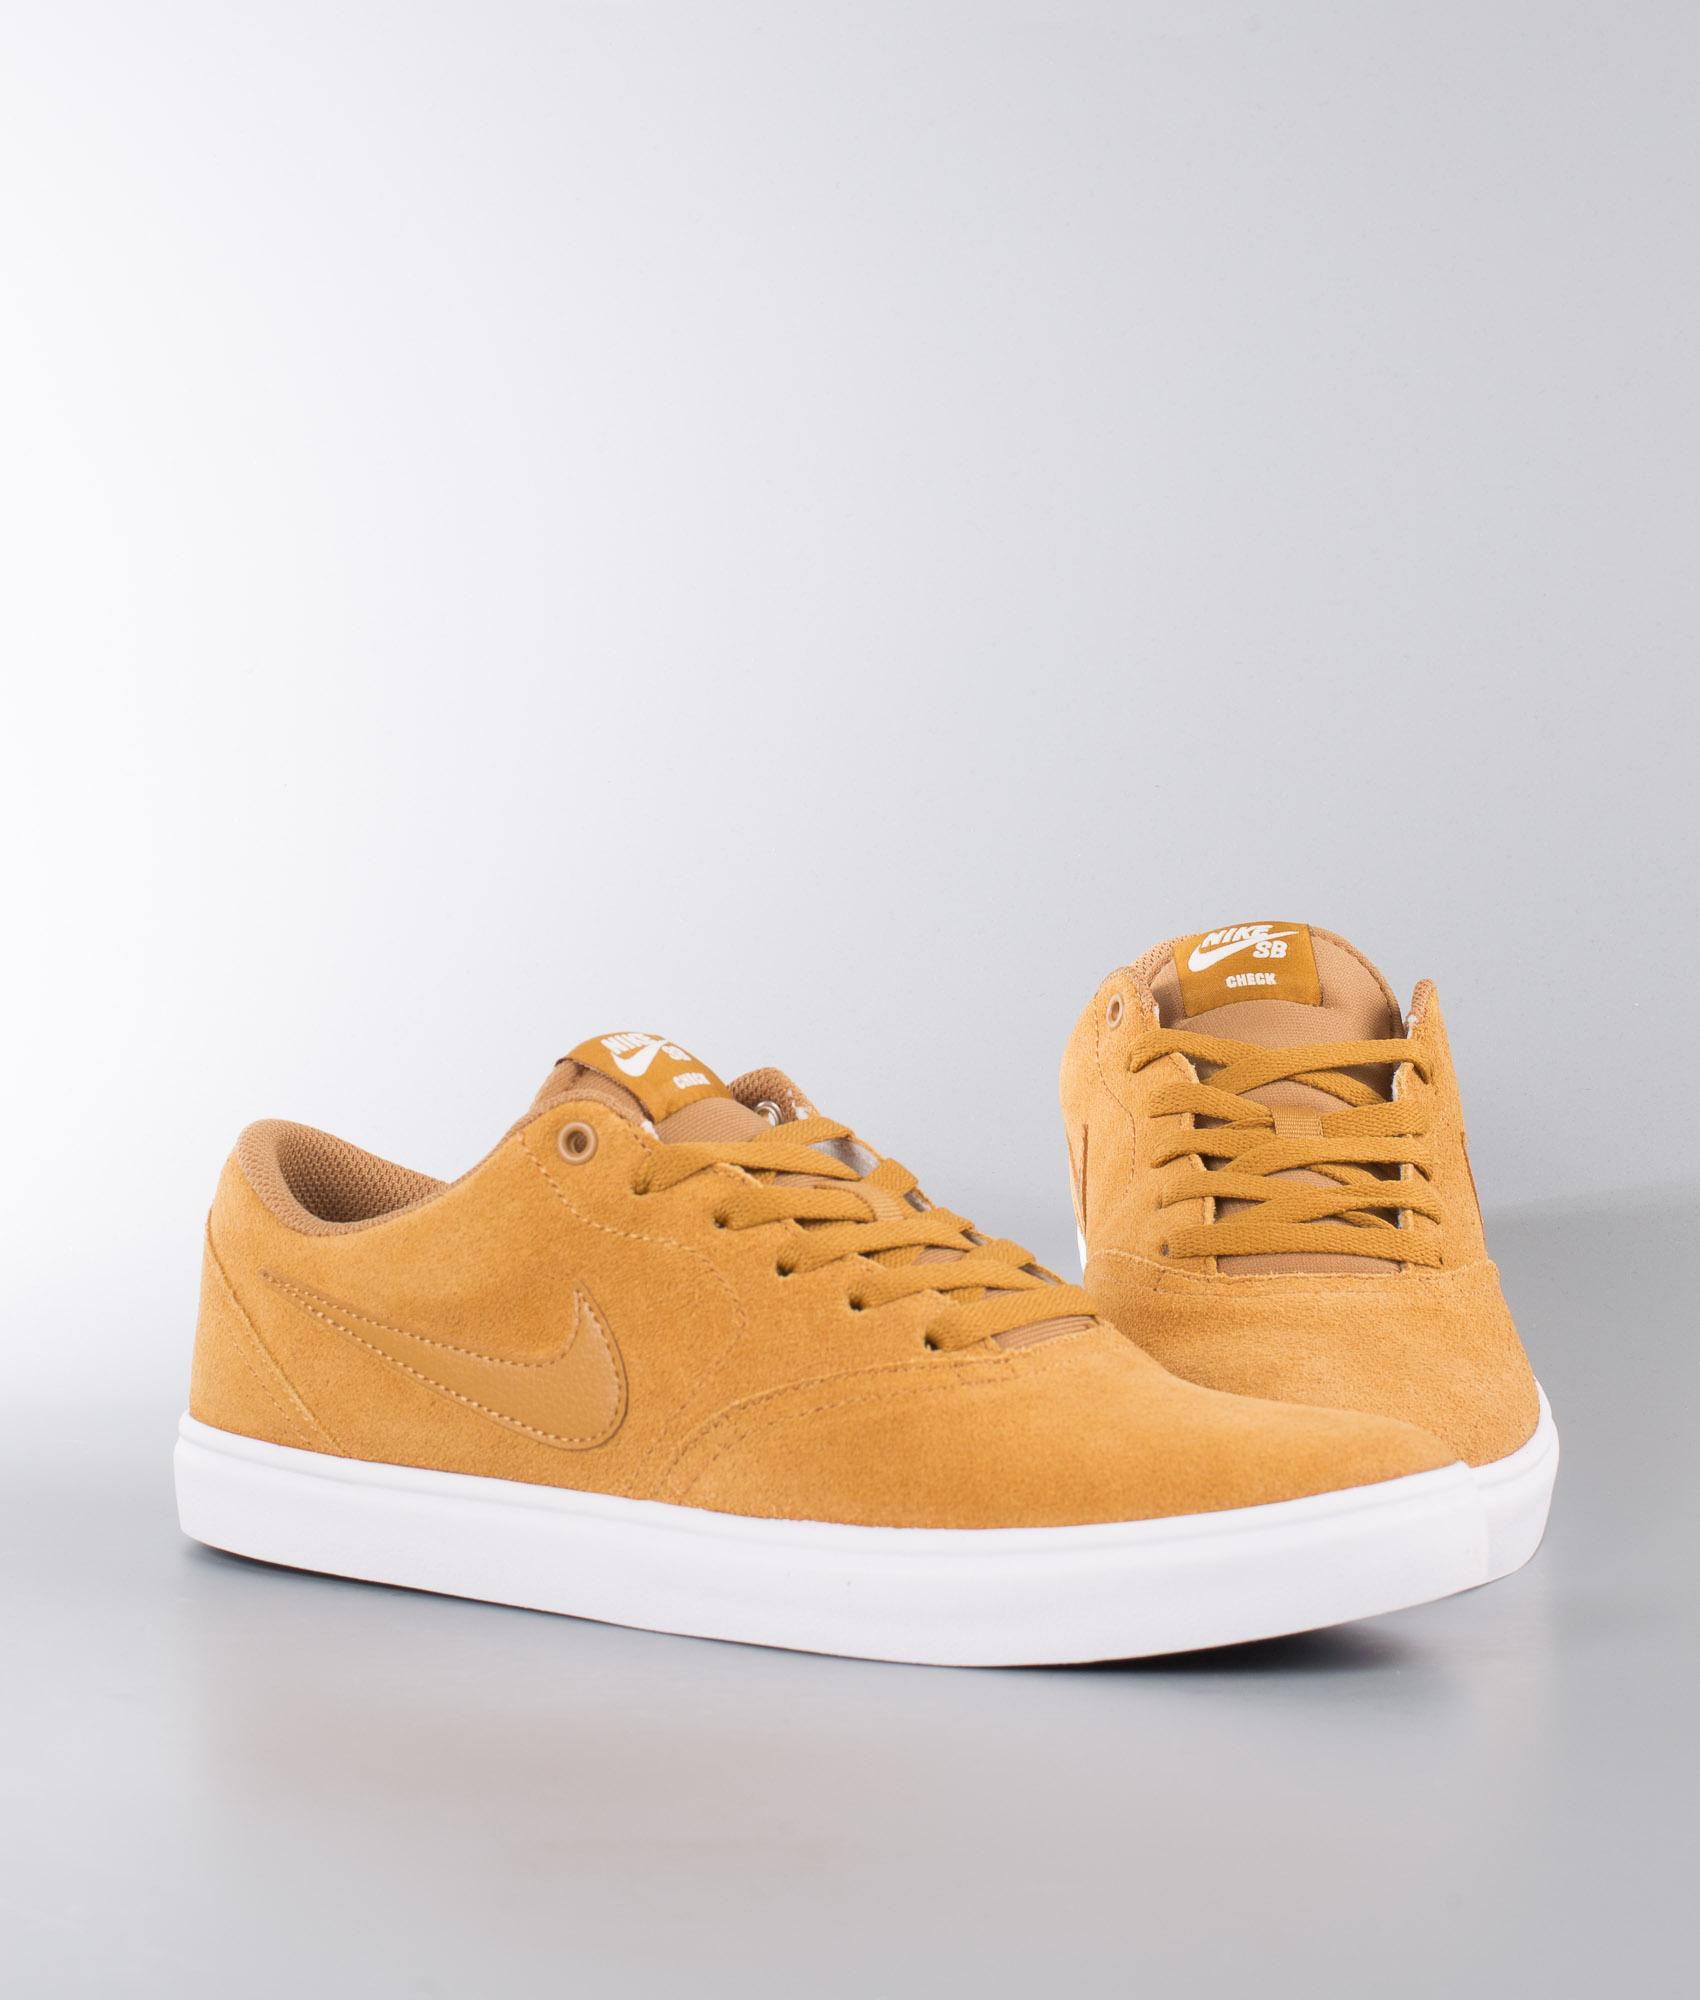 Nike Check Solar Shoes Wheat/Wheat